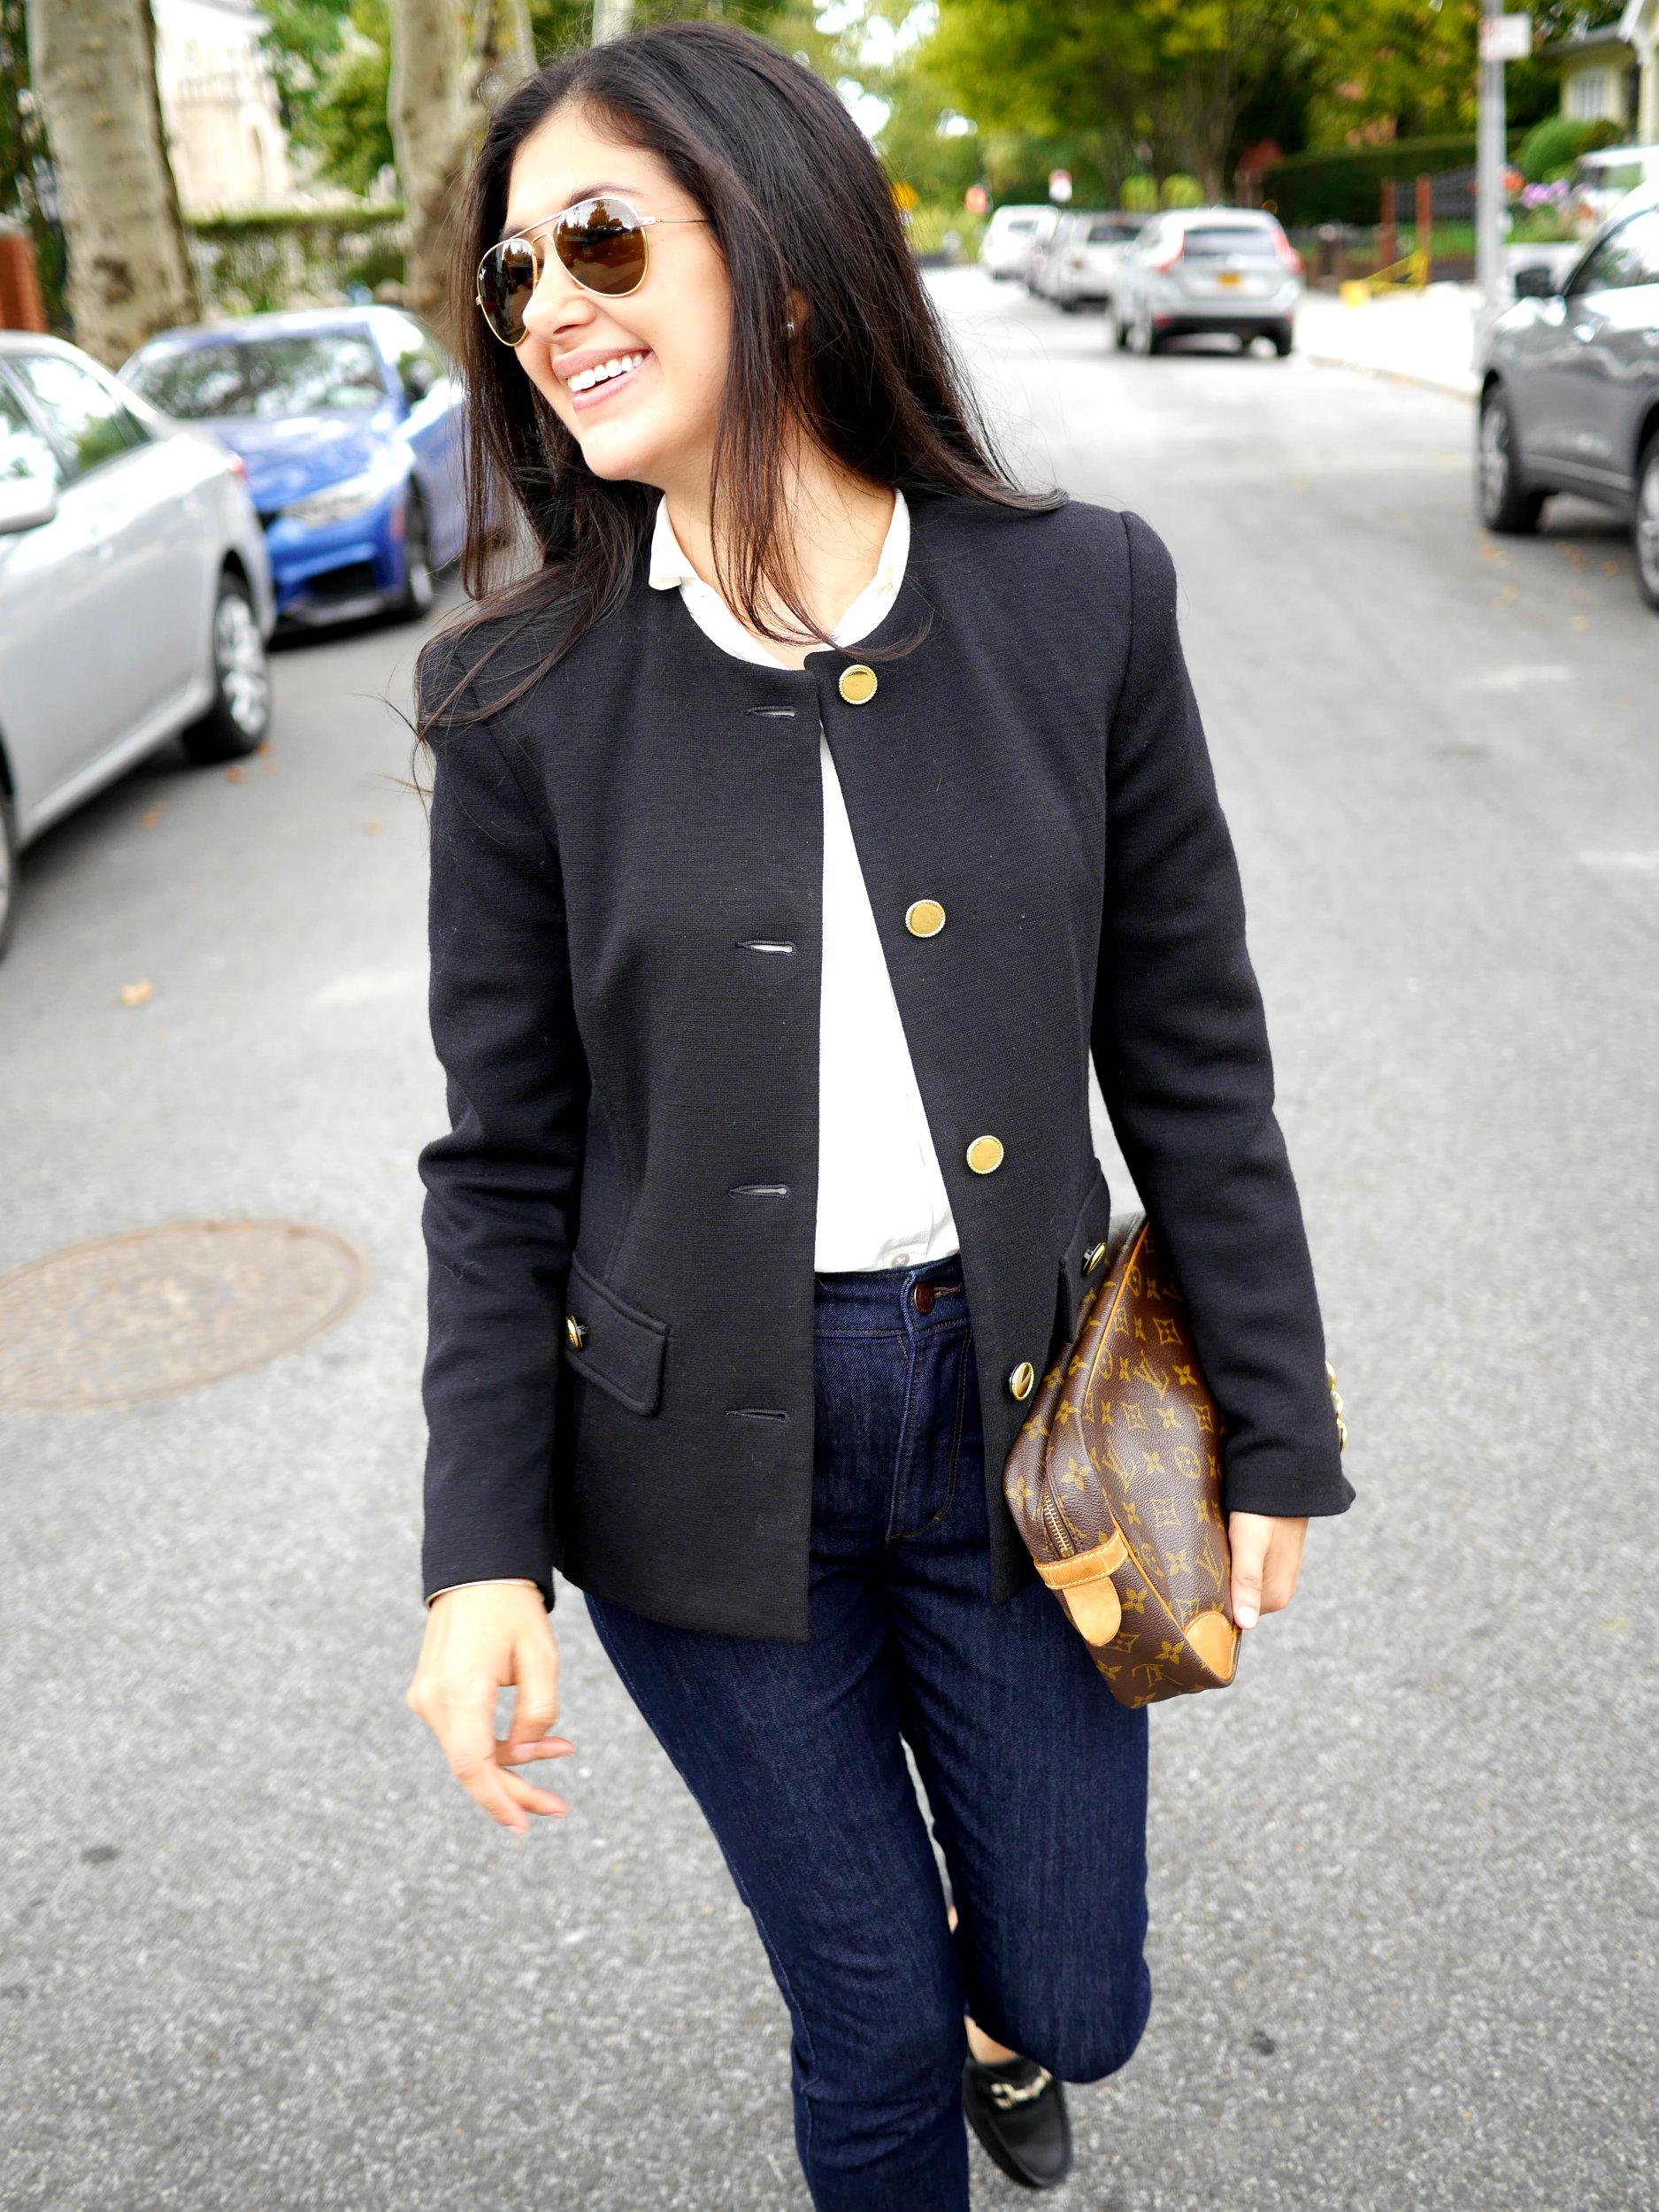 Brooks Brothers Blazer Everlane Silk Shirt Gucci Loafers Ray Ban Aviators Louis Vuitton Clutch